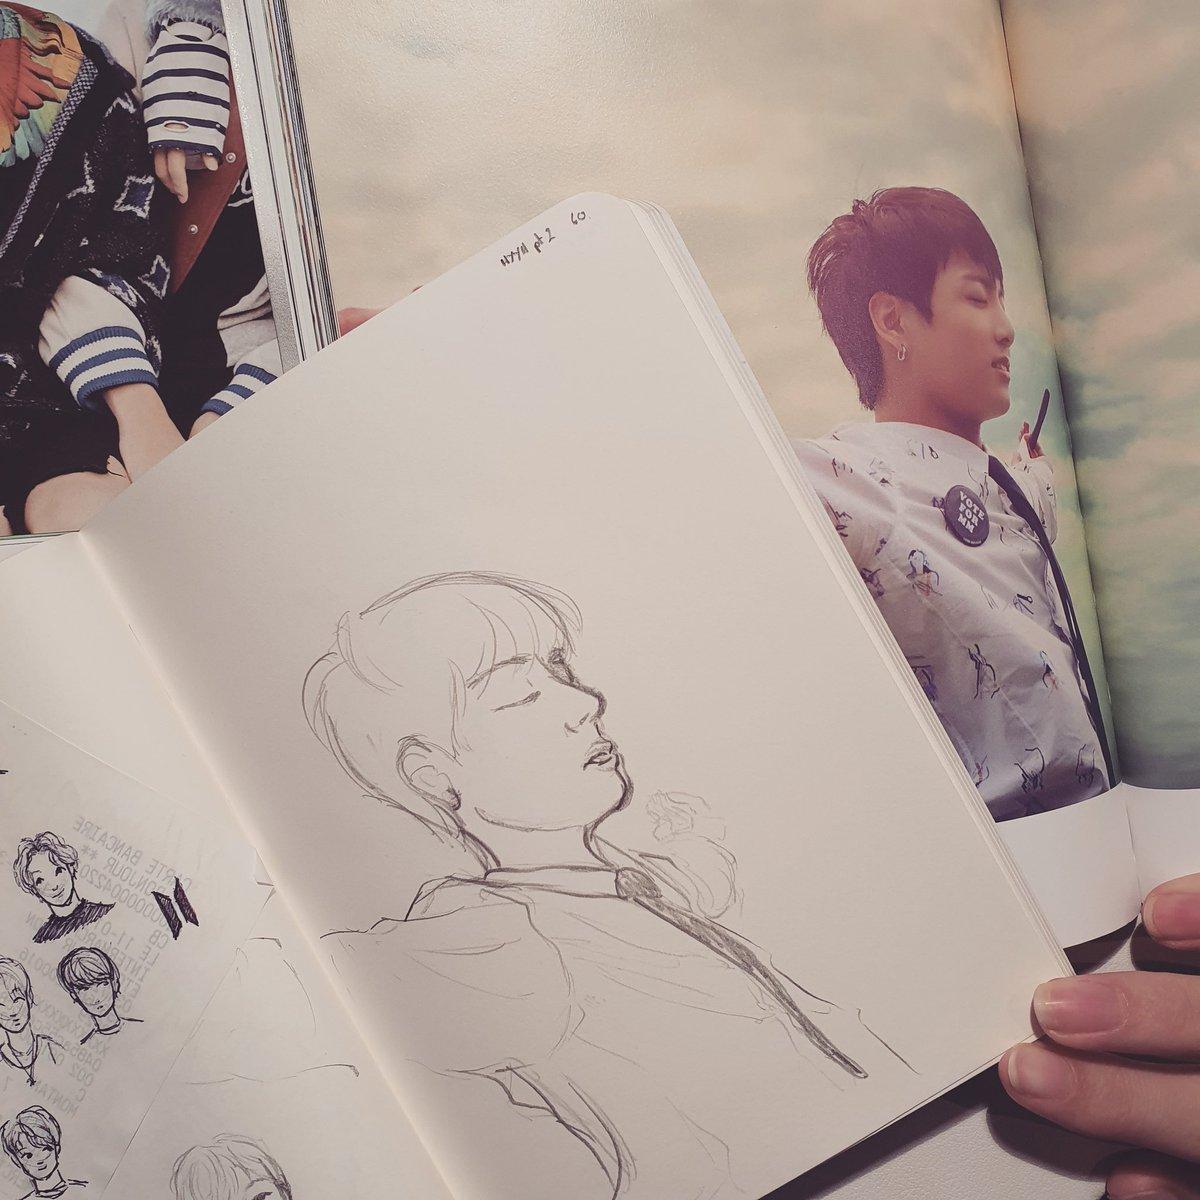 Poor Jk looks like he hit a wall ^^' #jungkook #jeonjungkook #btsjungkook #bts #bangtansonyeondan #btsfanart #sketch #sketchbook #drawing #art #bangtan #onebangtanaday #baguettesarmysxart #hyyhpt2 #hyyh #themostbeautifulmomentinlifept2